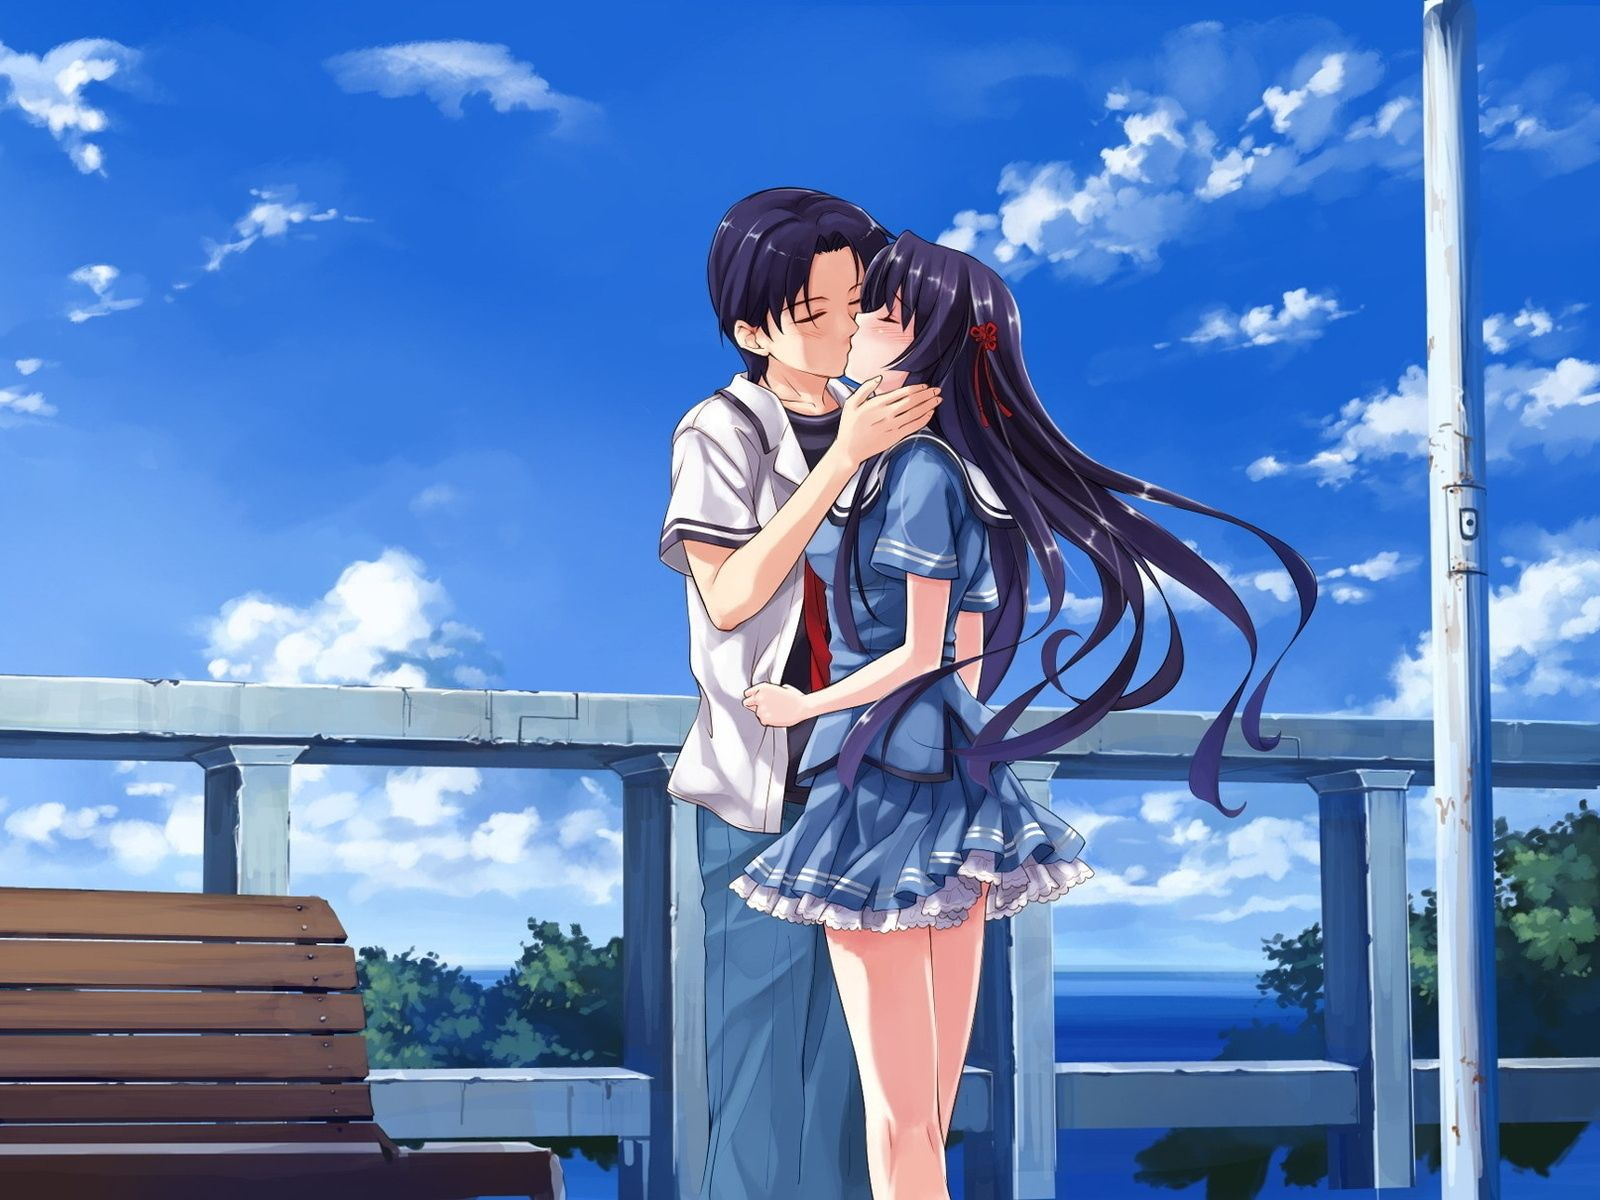 Download Wallpaper 1600x1200 Boy Girl Kiss Bench Sky Street 1600x1200 Hd Background Seni